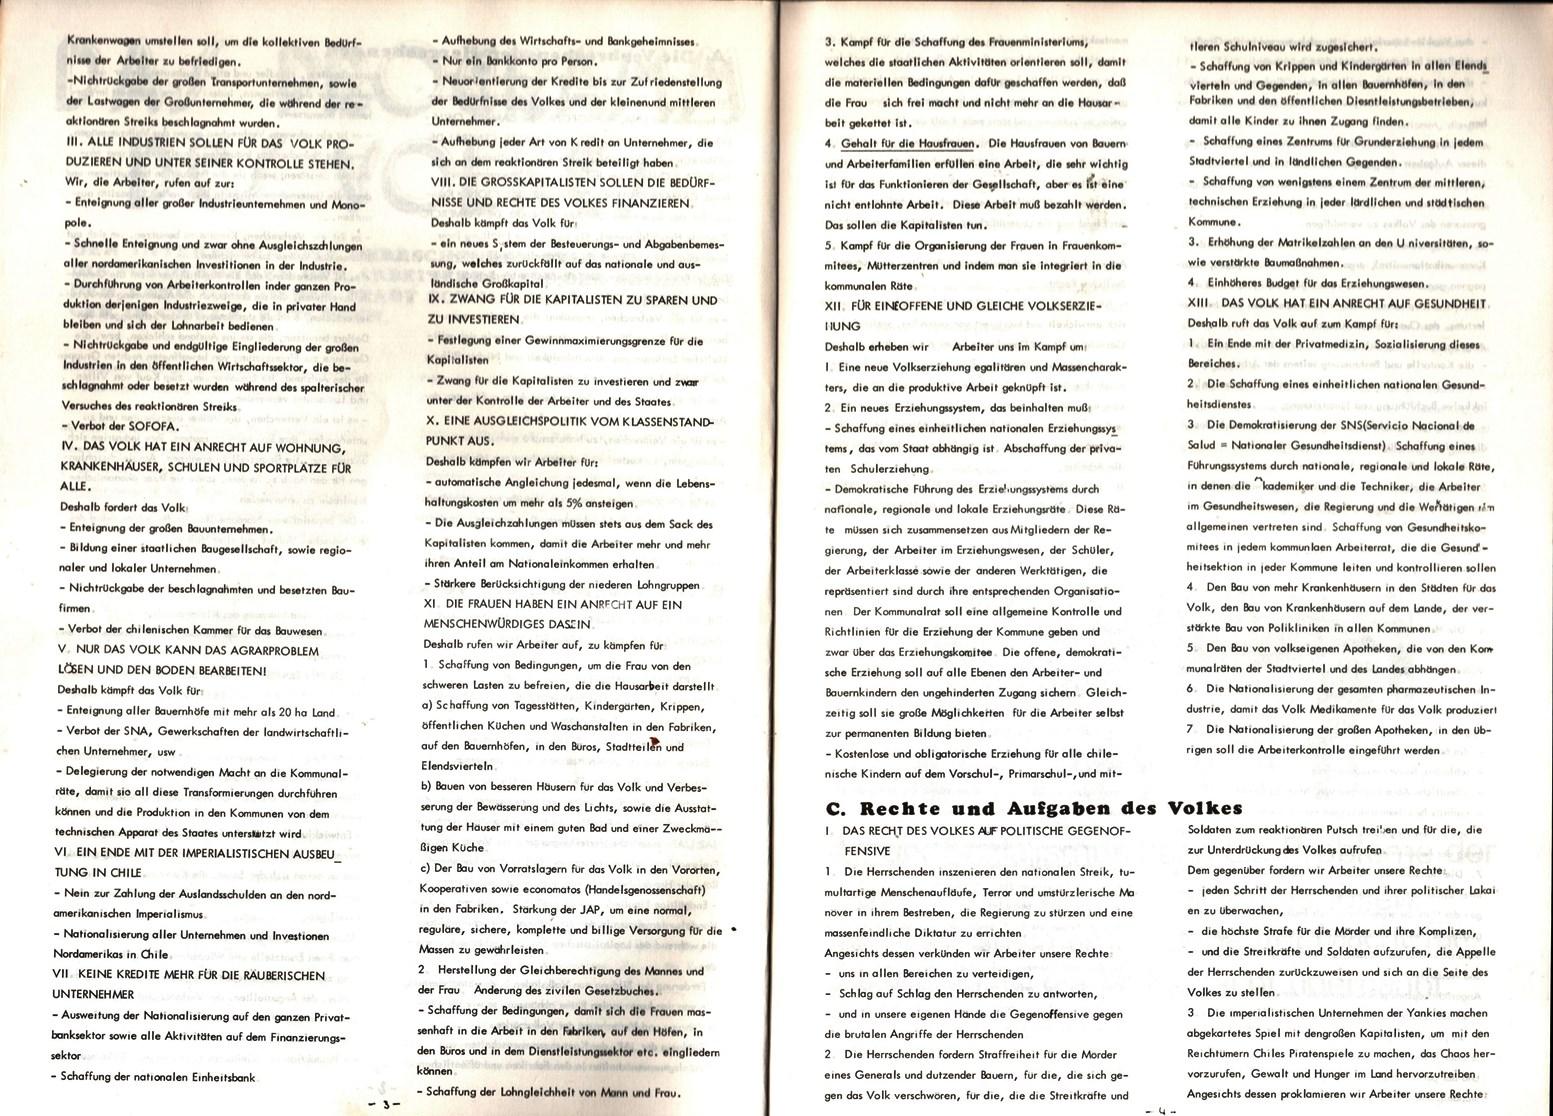 Lateinamerika_heute_Sonderbericht_Chile_Nr_04_005